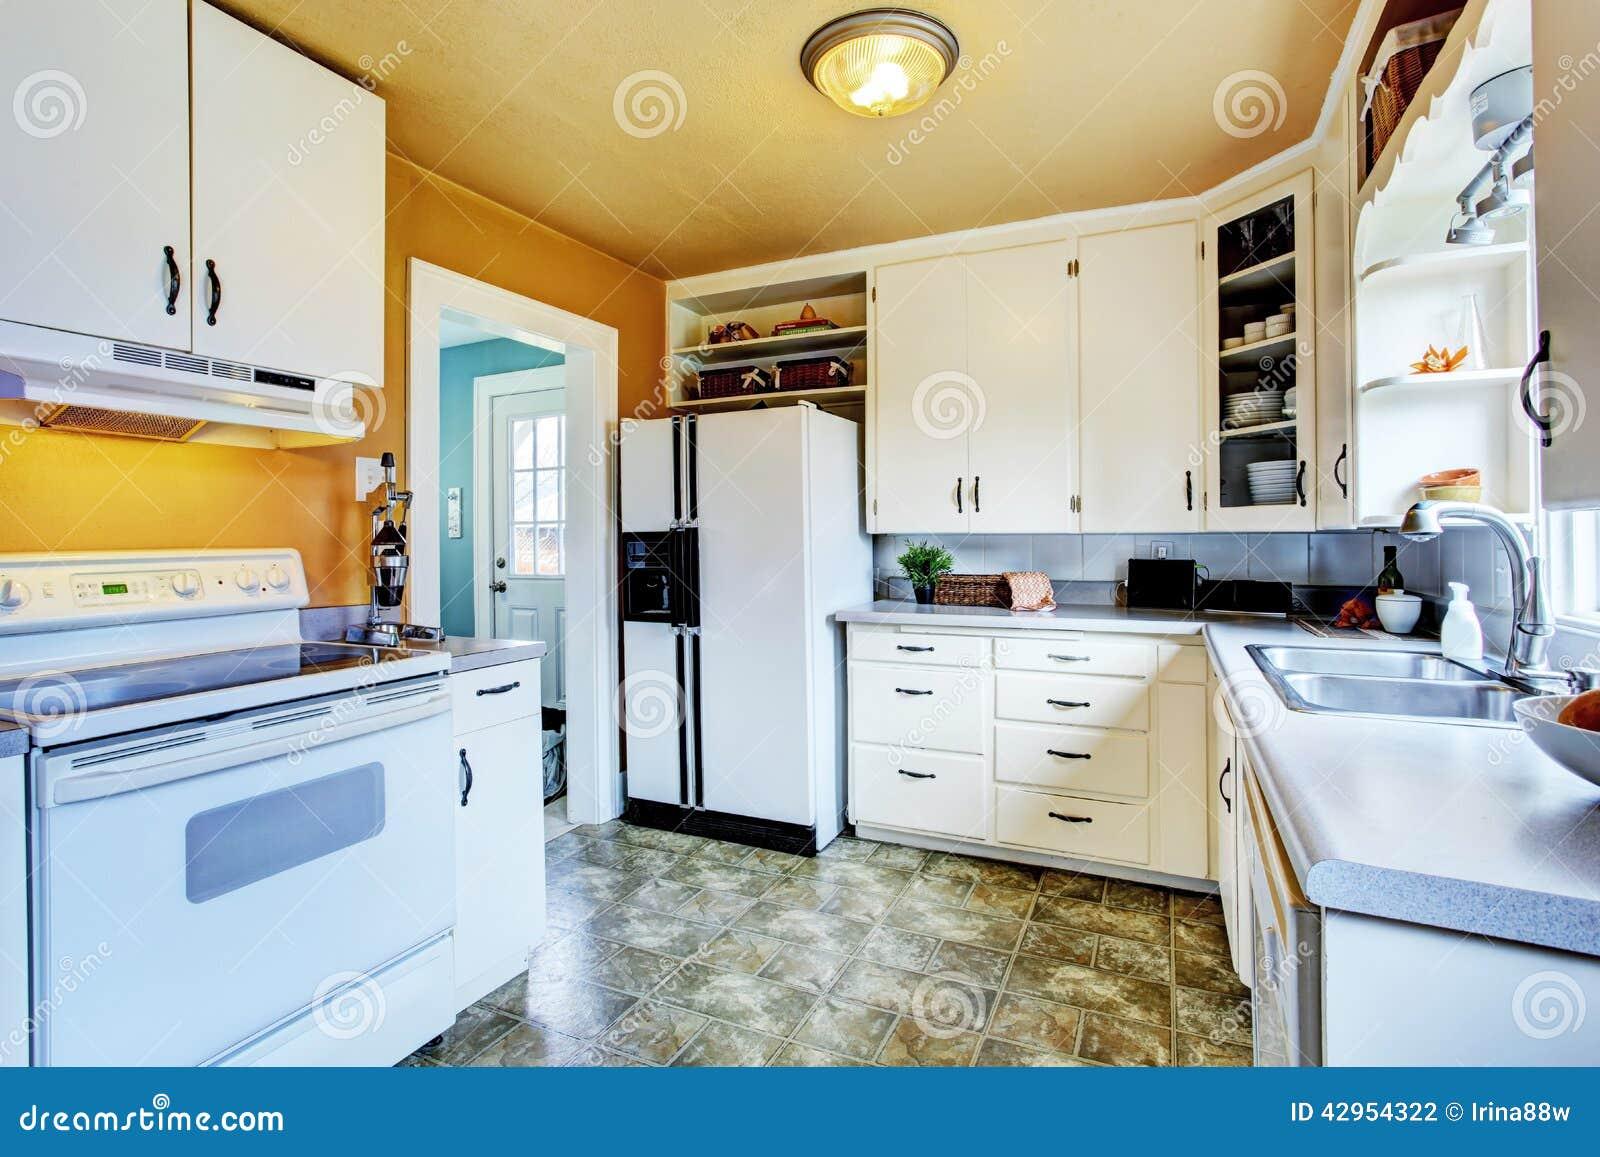 Peach Kitchen White Kitchen Interior With Peach Walls And Khaki Linoleum Stock